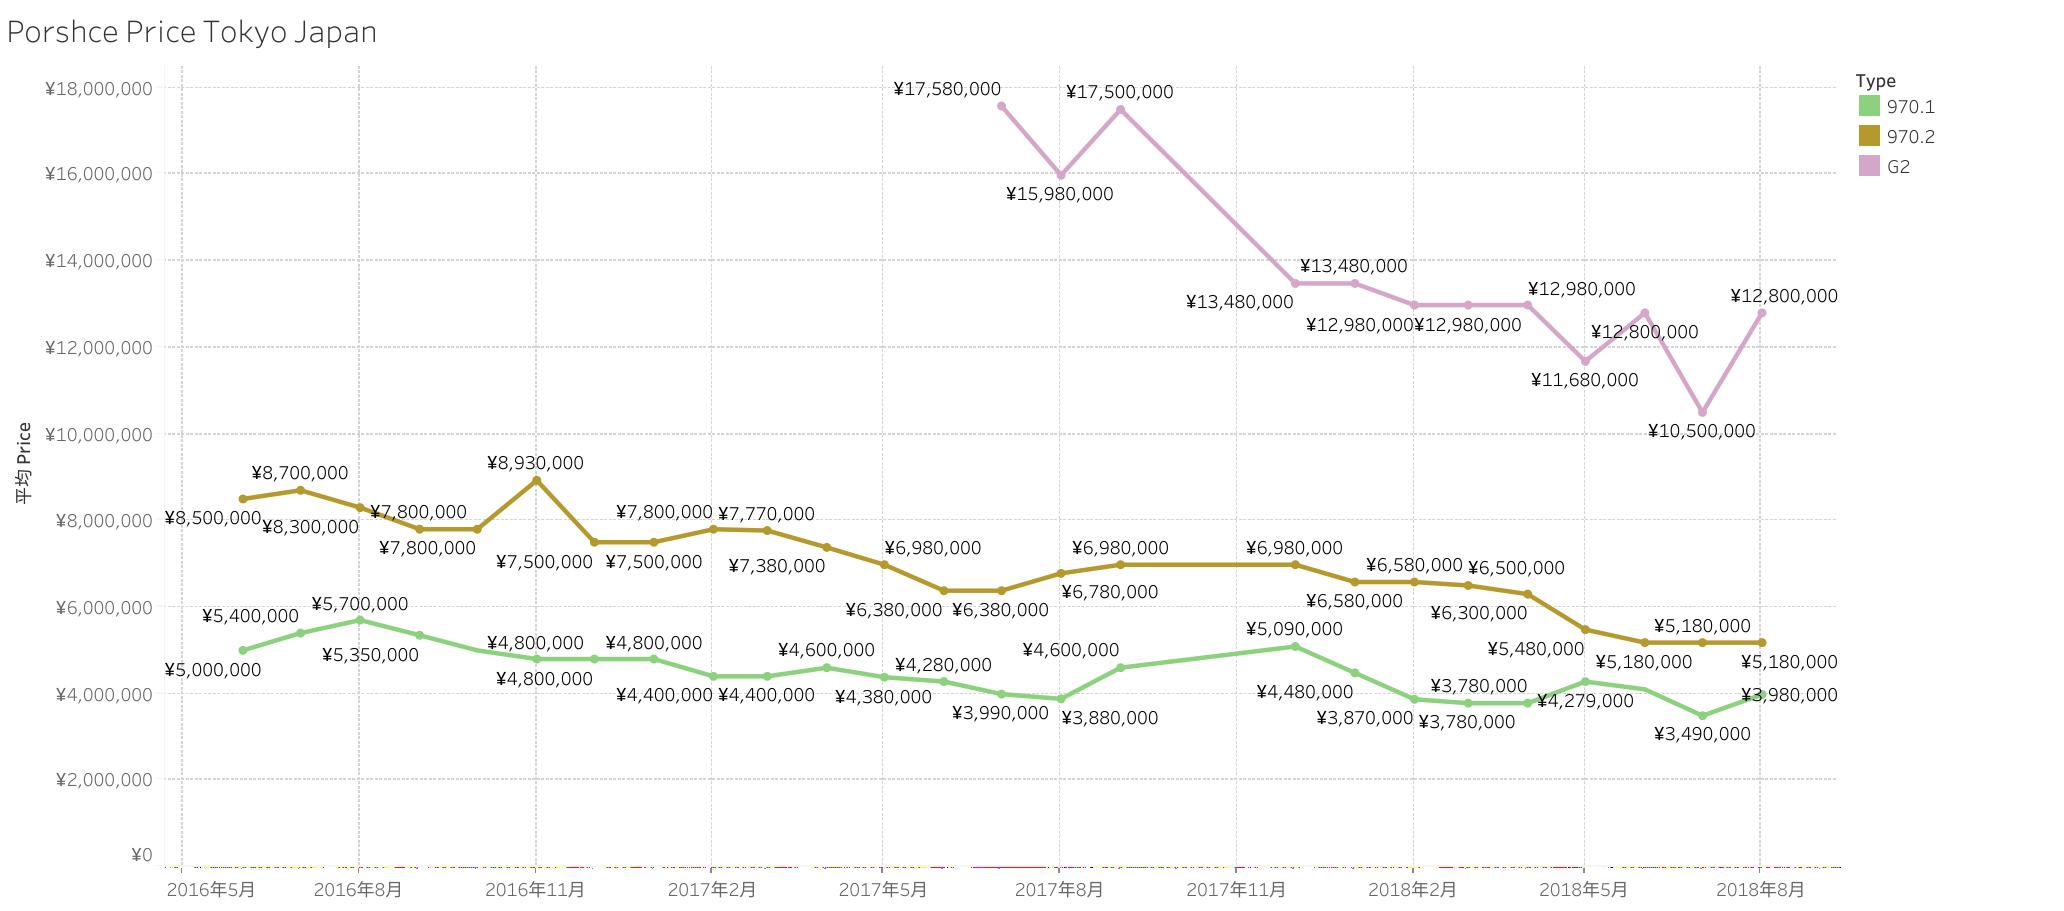 Porshce Price Tokyo Japan Panmera 201808